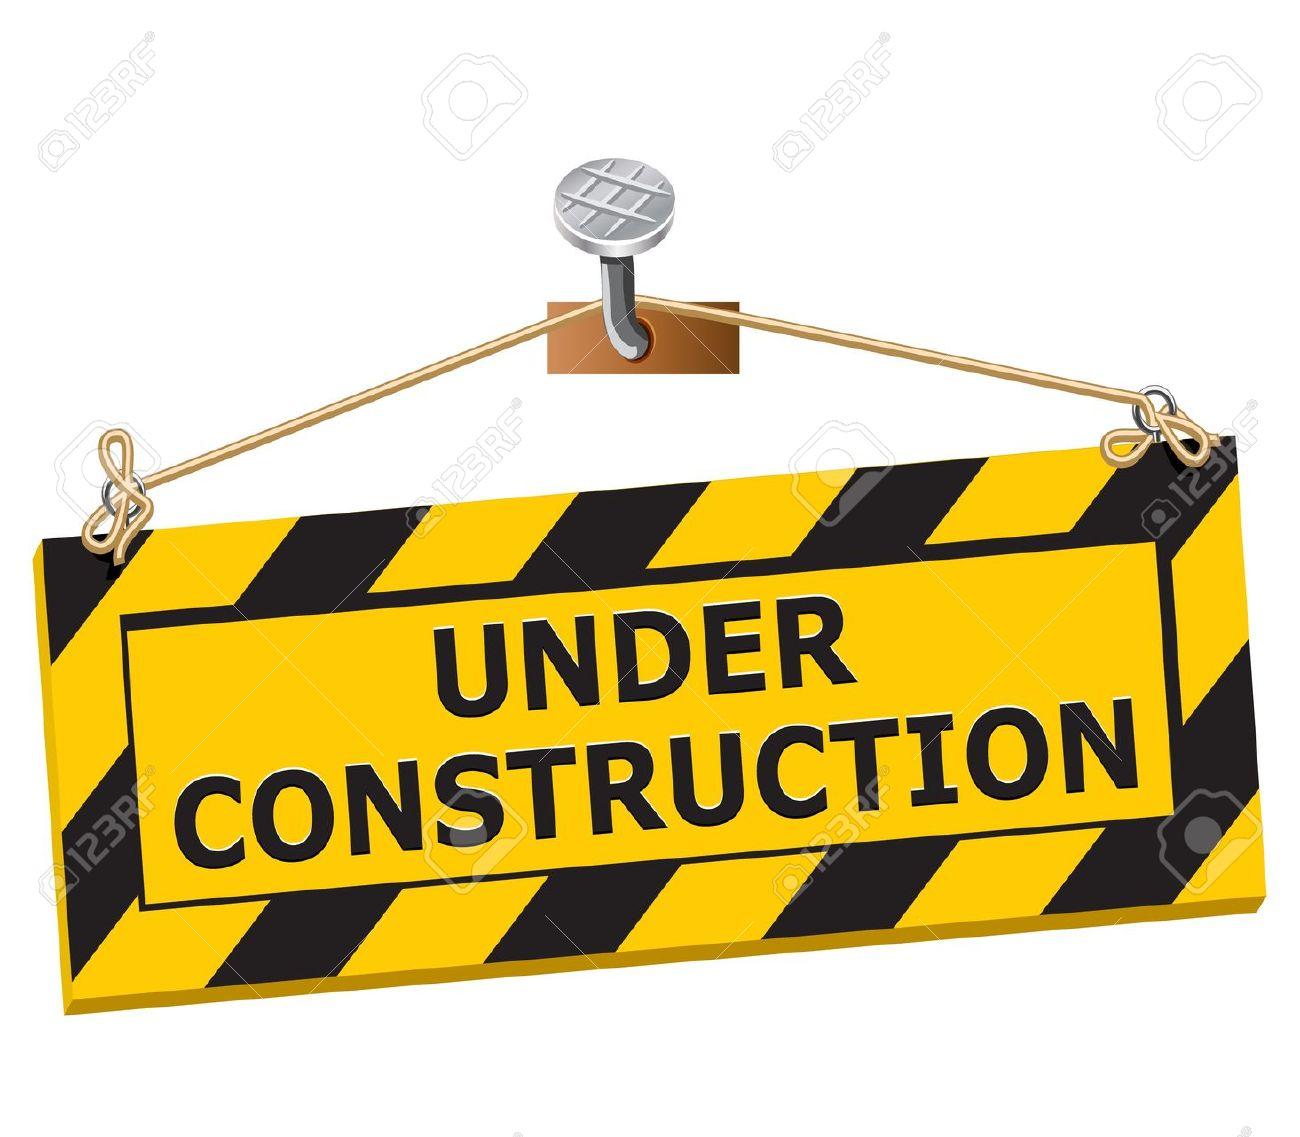 Under Construktion